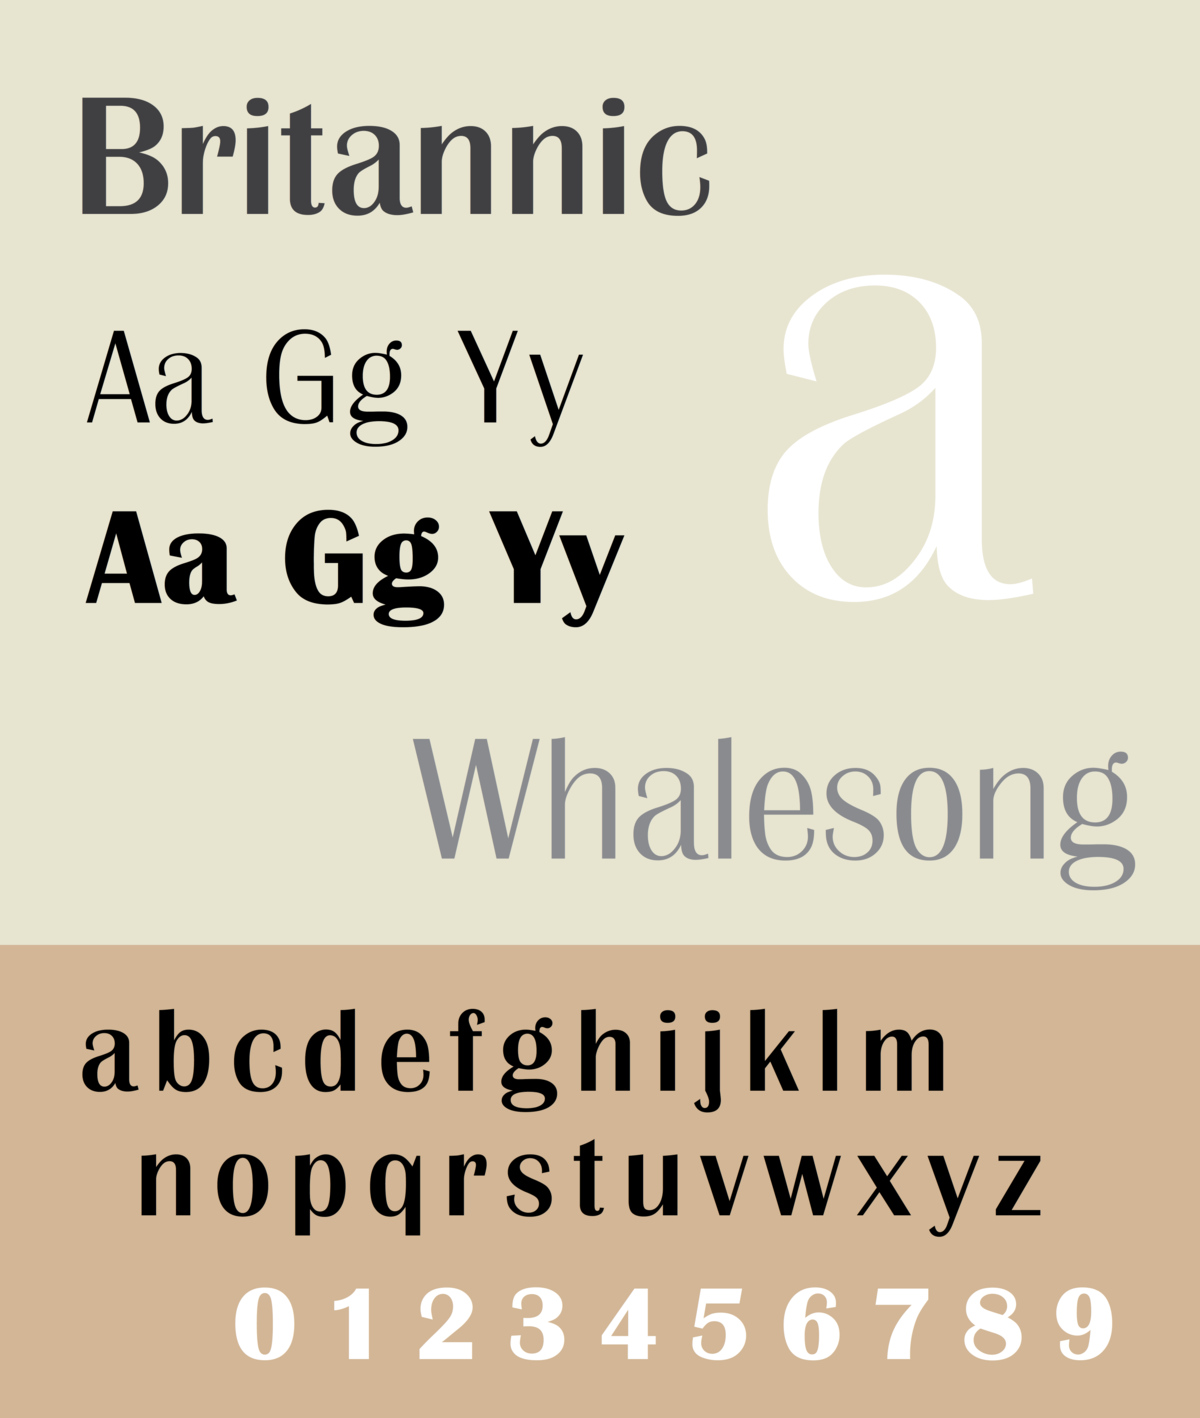 Britannic (typeface) - Wikipedia